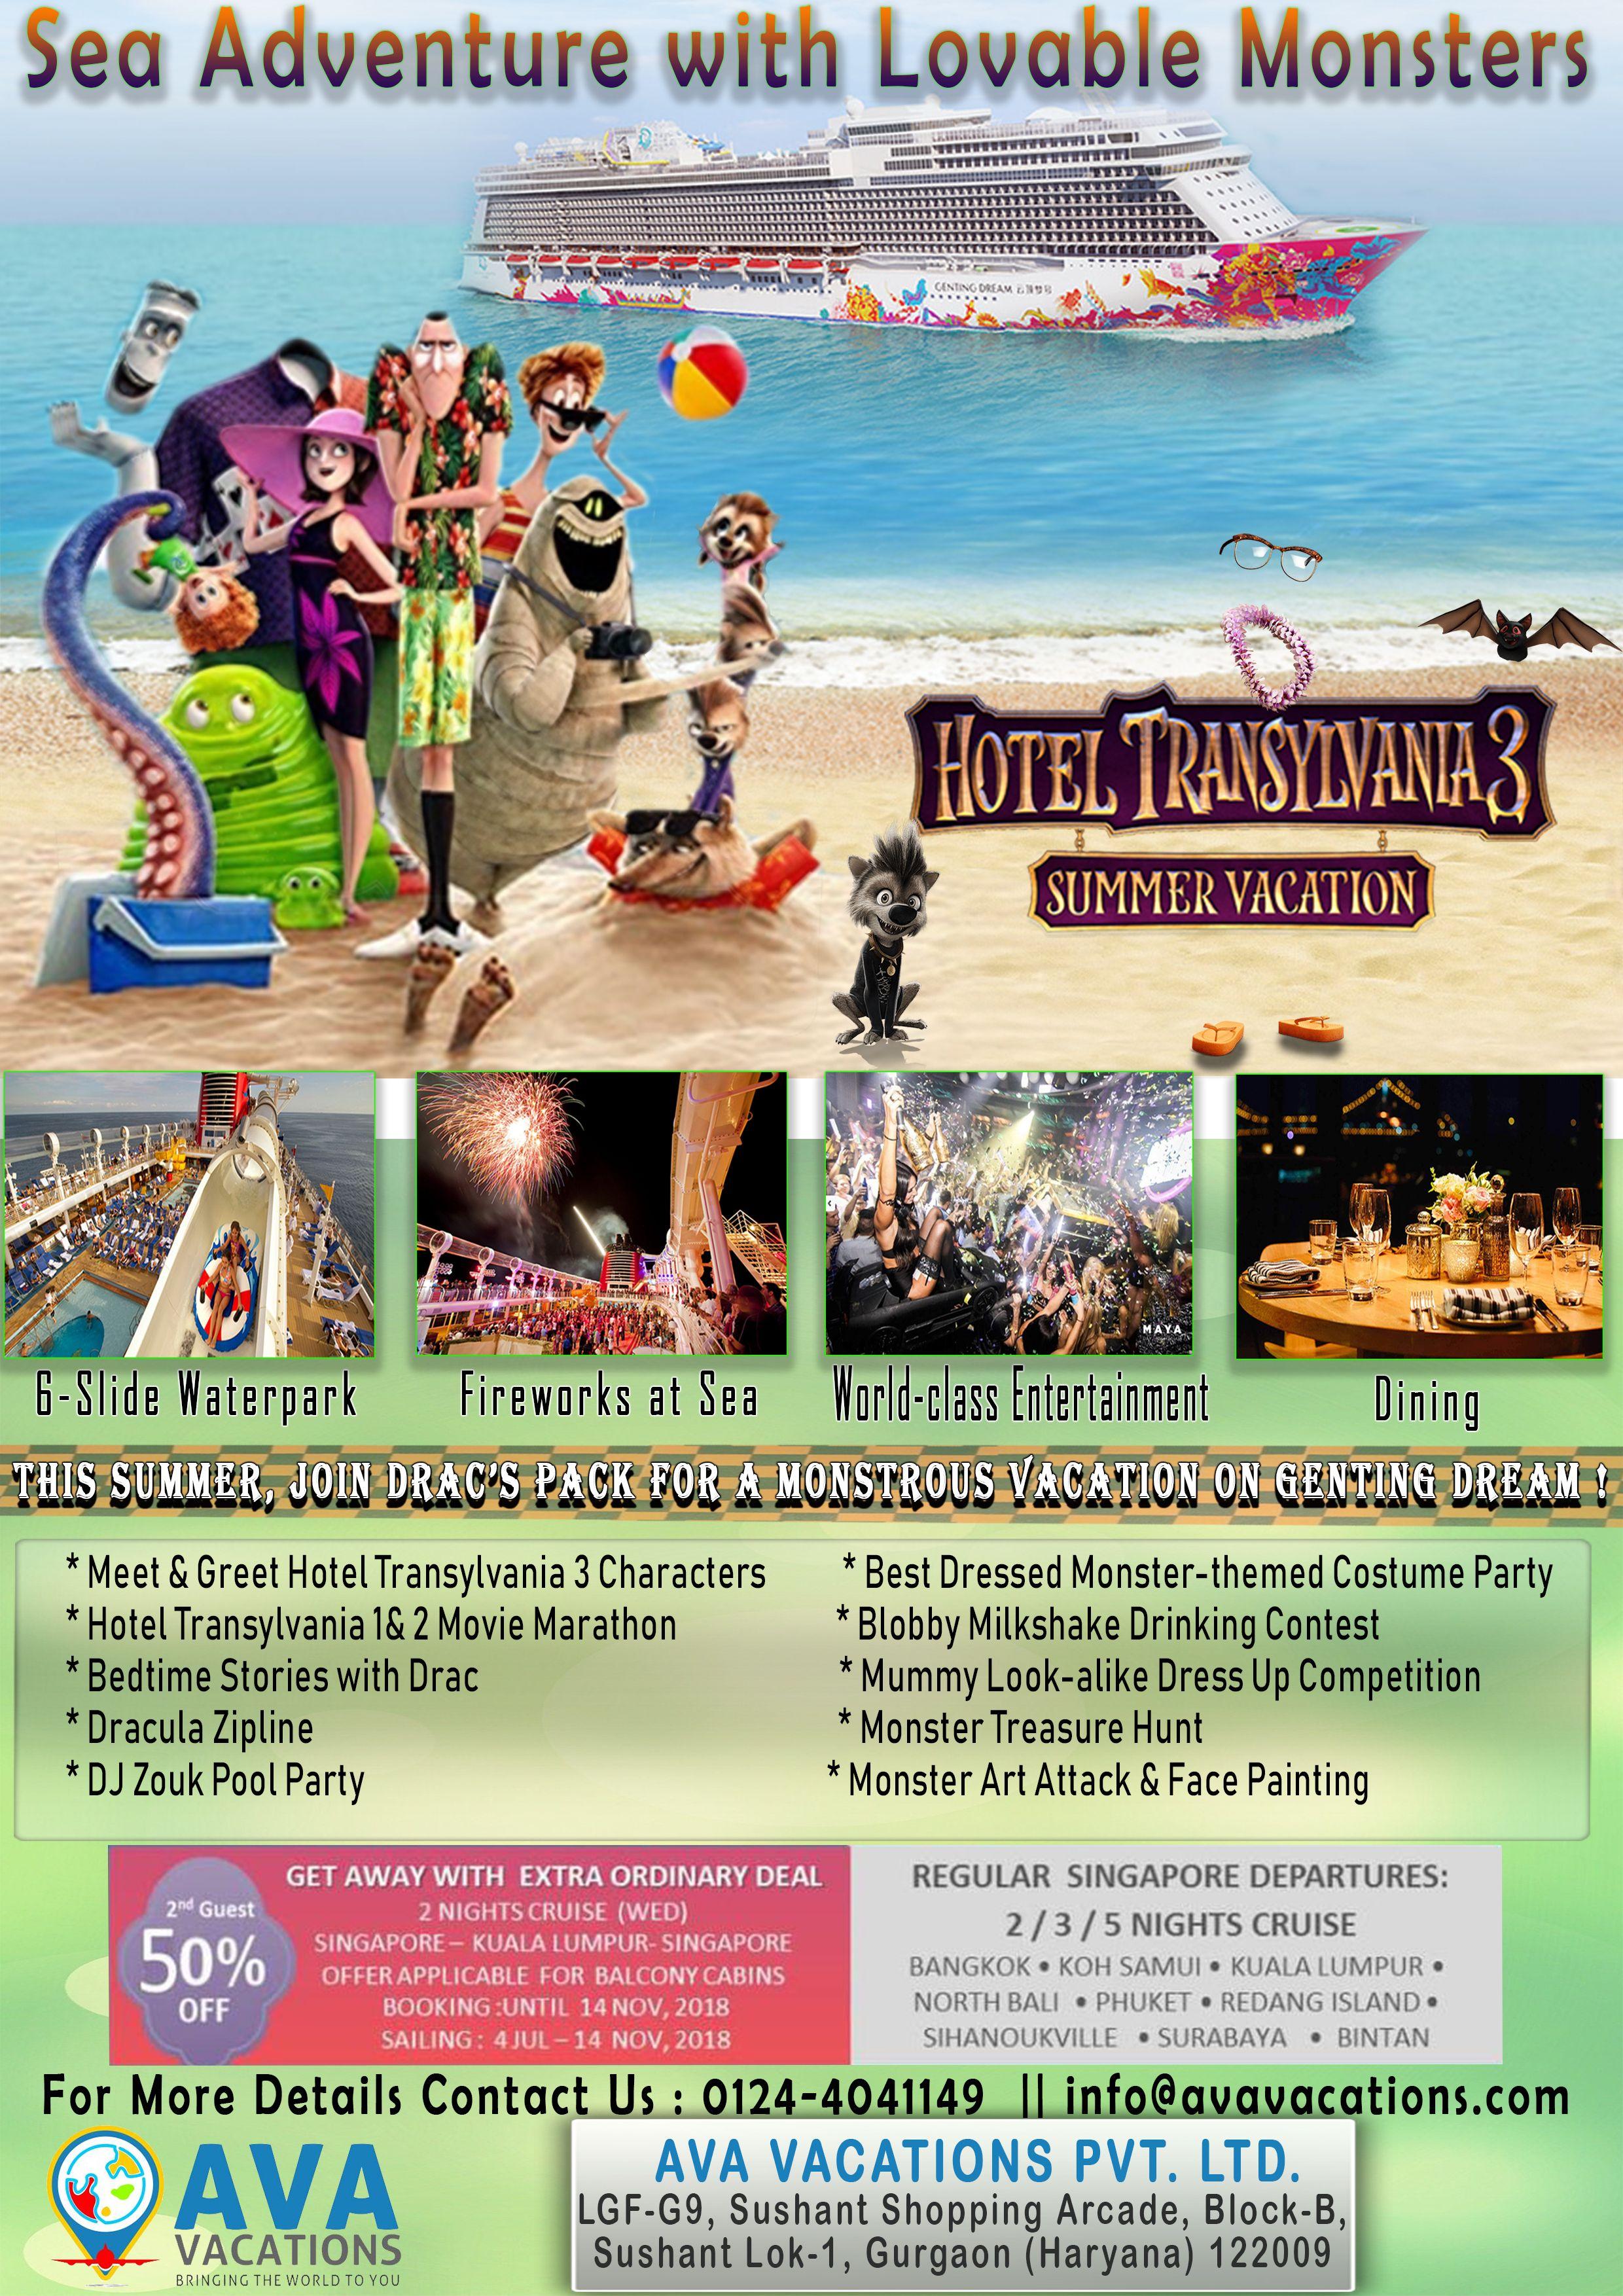 Hotel Transylvania 3 Summer Vacation Cruises Ava Vacations Pvt Ltd